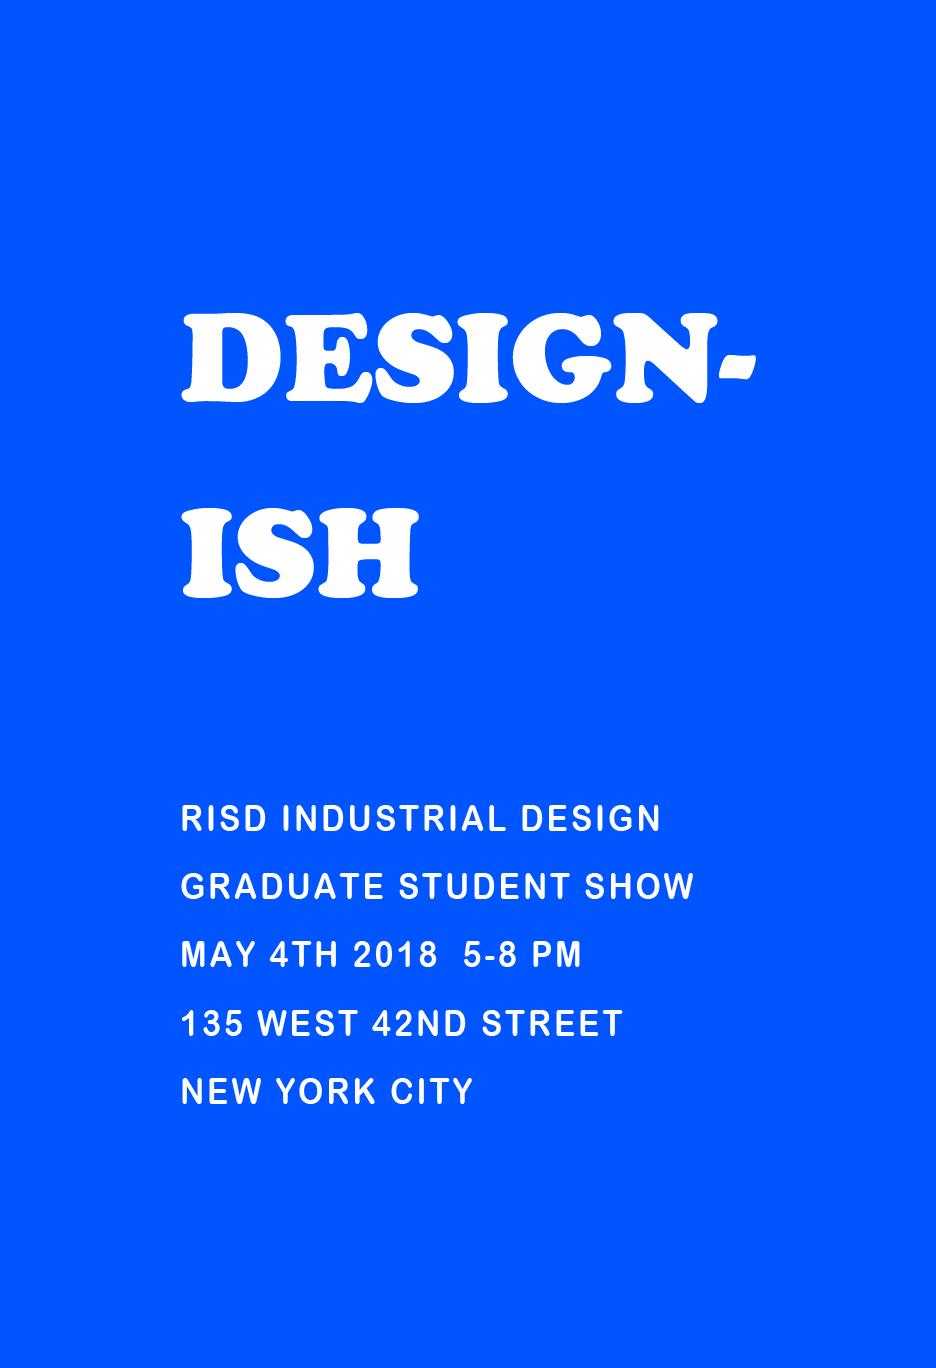 2018SP.GradThesisMaking.Designish.Pittman_Dave.NYC Designish Poster.png